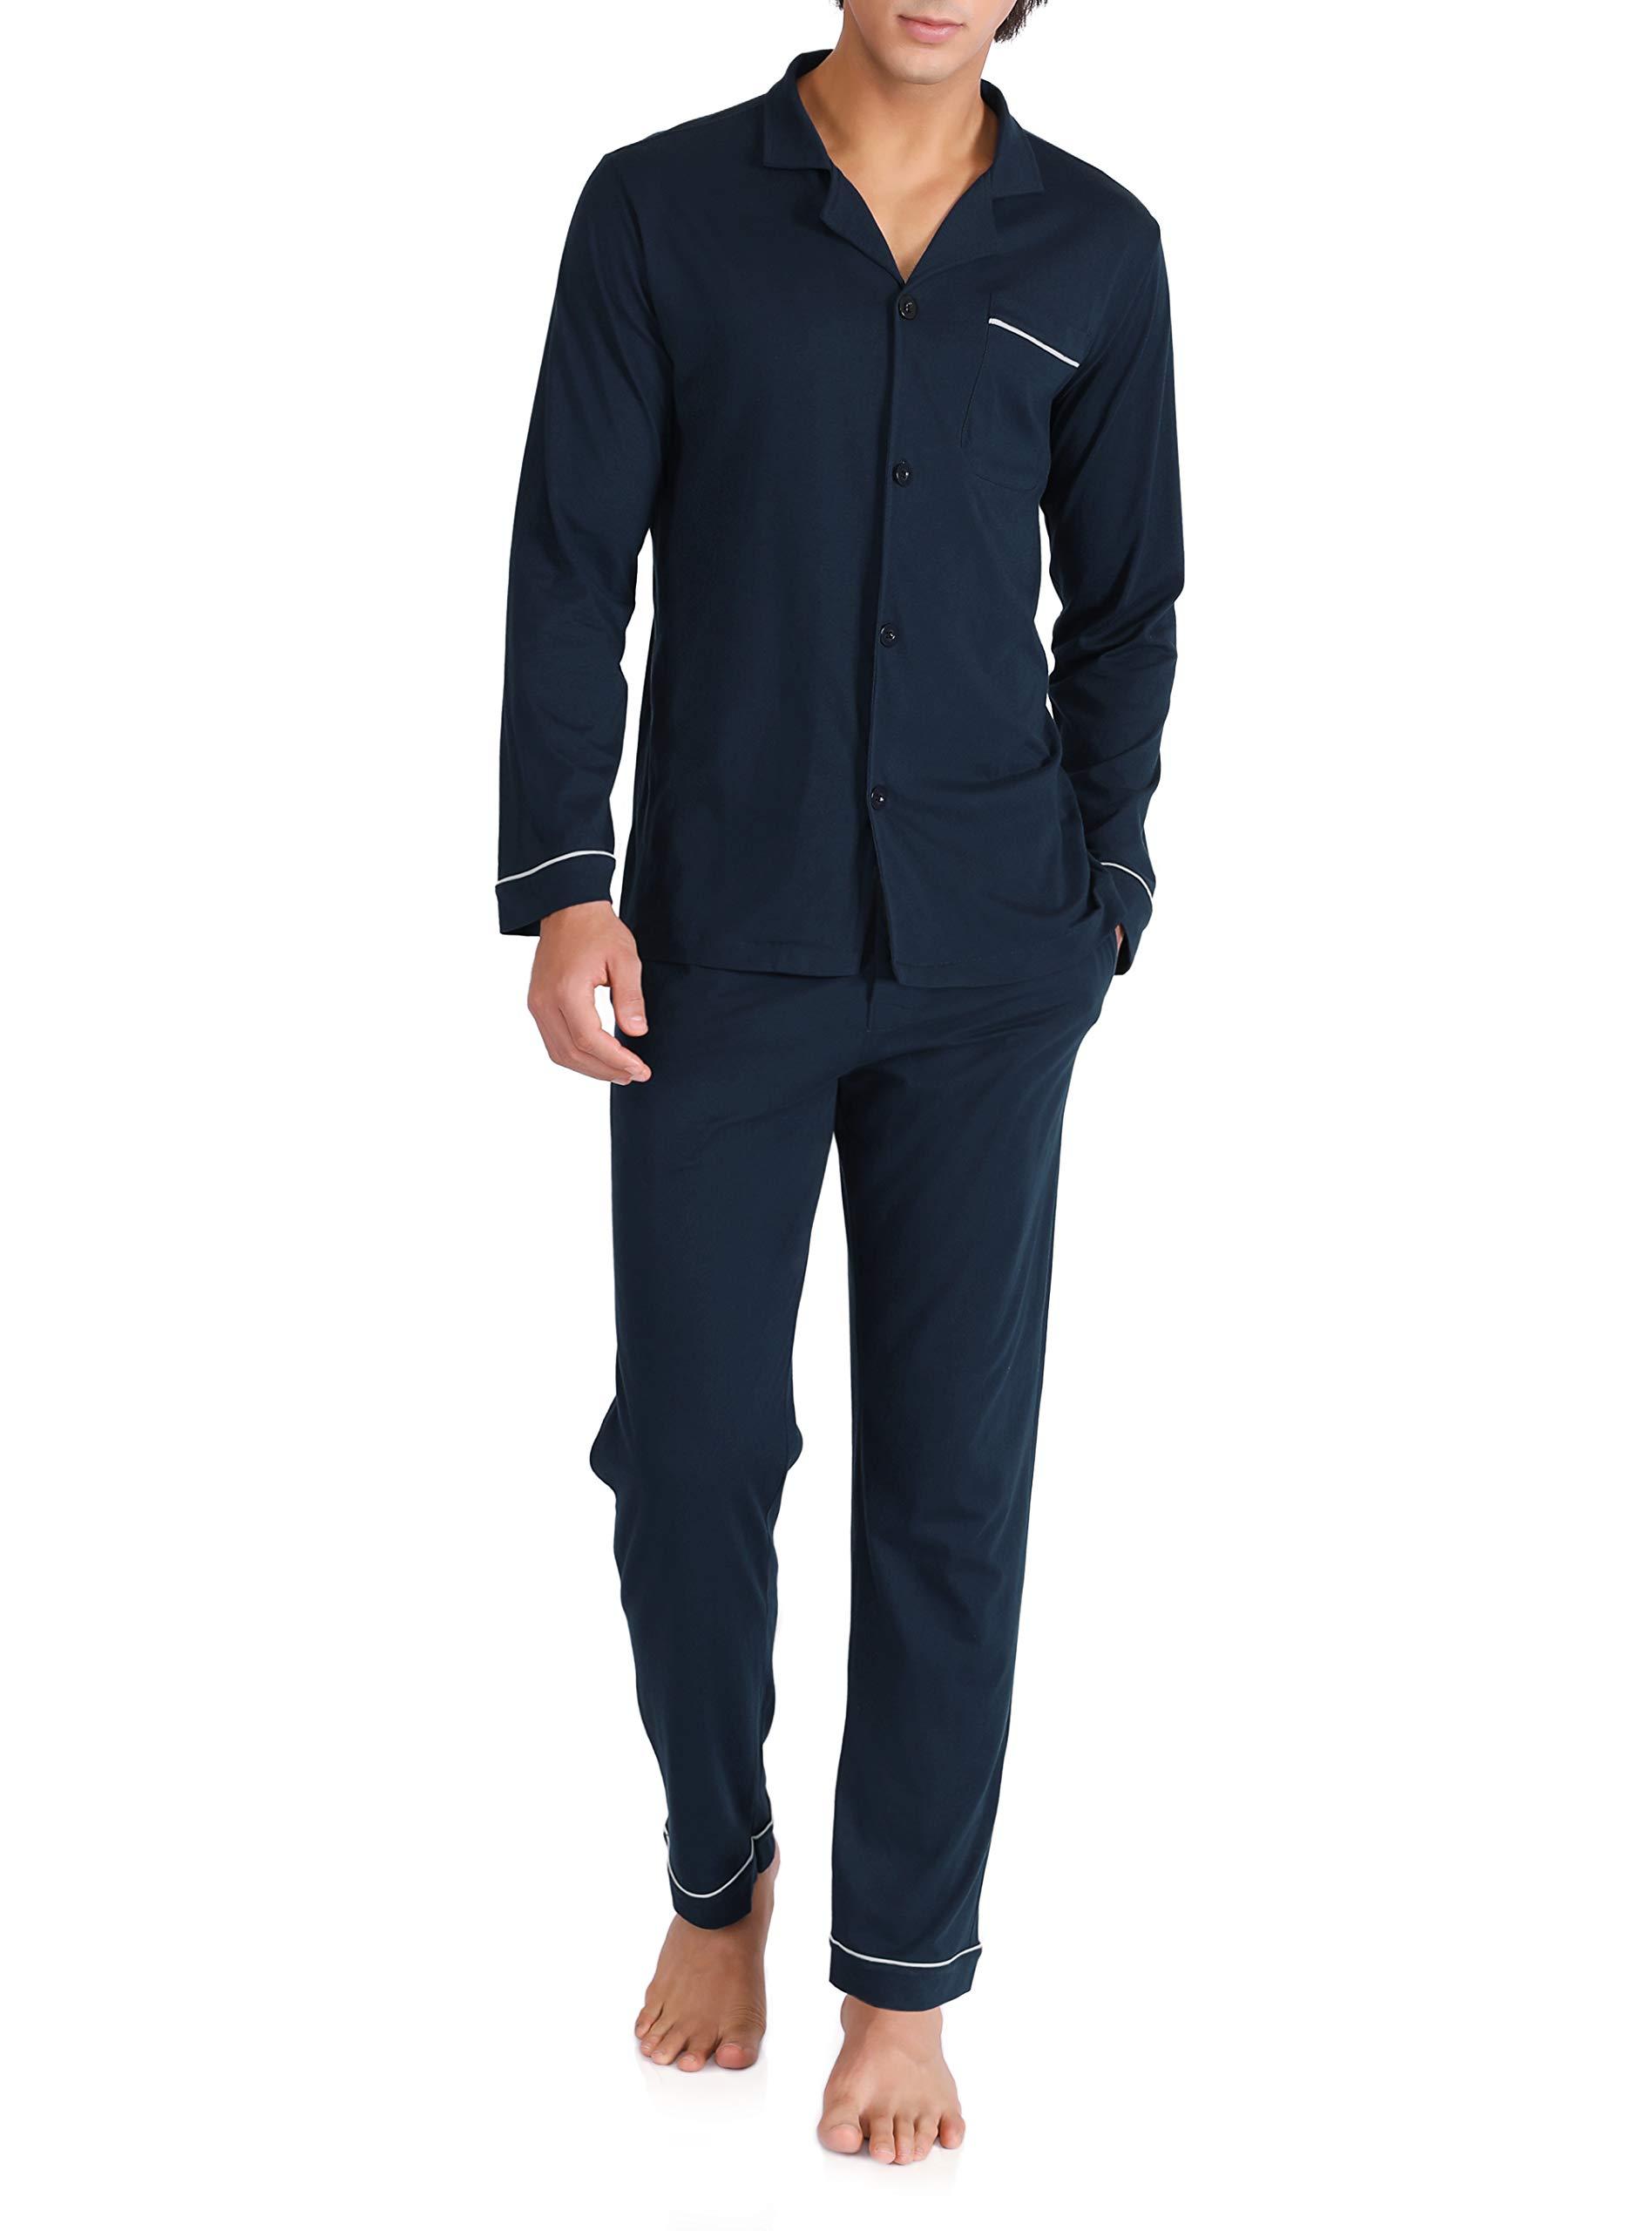 David Archy Men's 100% Cotton Long Button-Down Sleepwear Pajama Set (XL, Navy Blue)